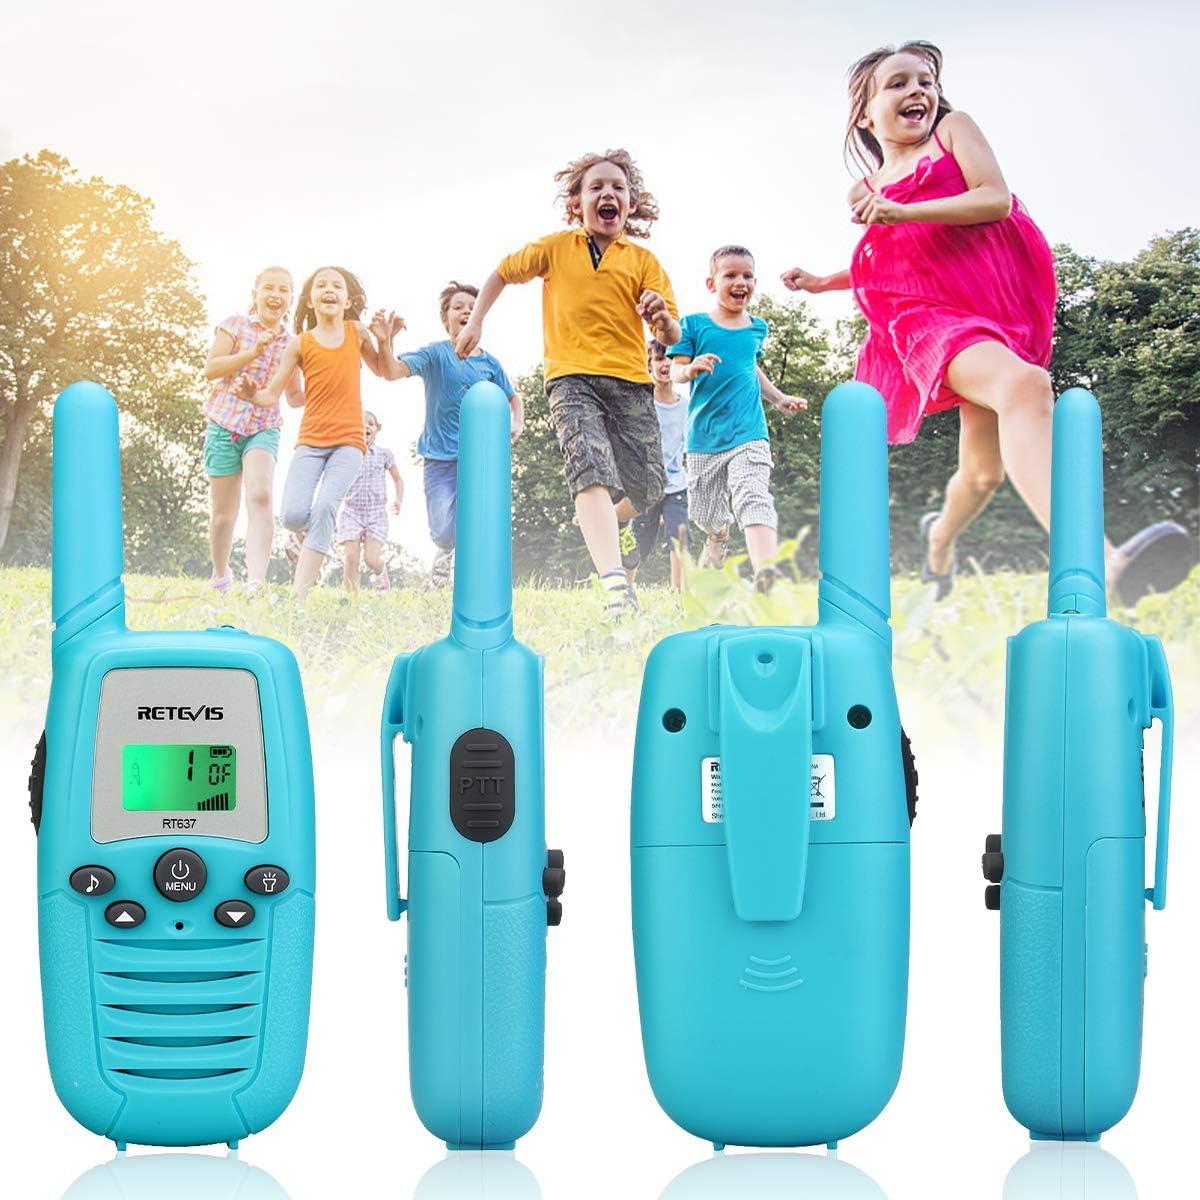 Blue,1 Pair Retevis RT637 Kids Walkie Talkies PMR446 16 Channel Flashlight VOX Walkie Talkie for Kids Easy Operation Toy Gift for Kids Children Walkie Talkies